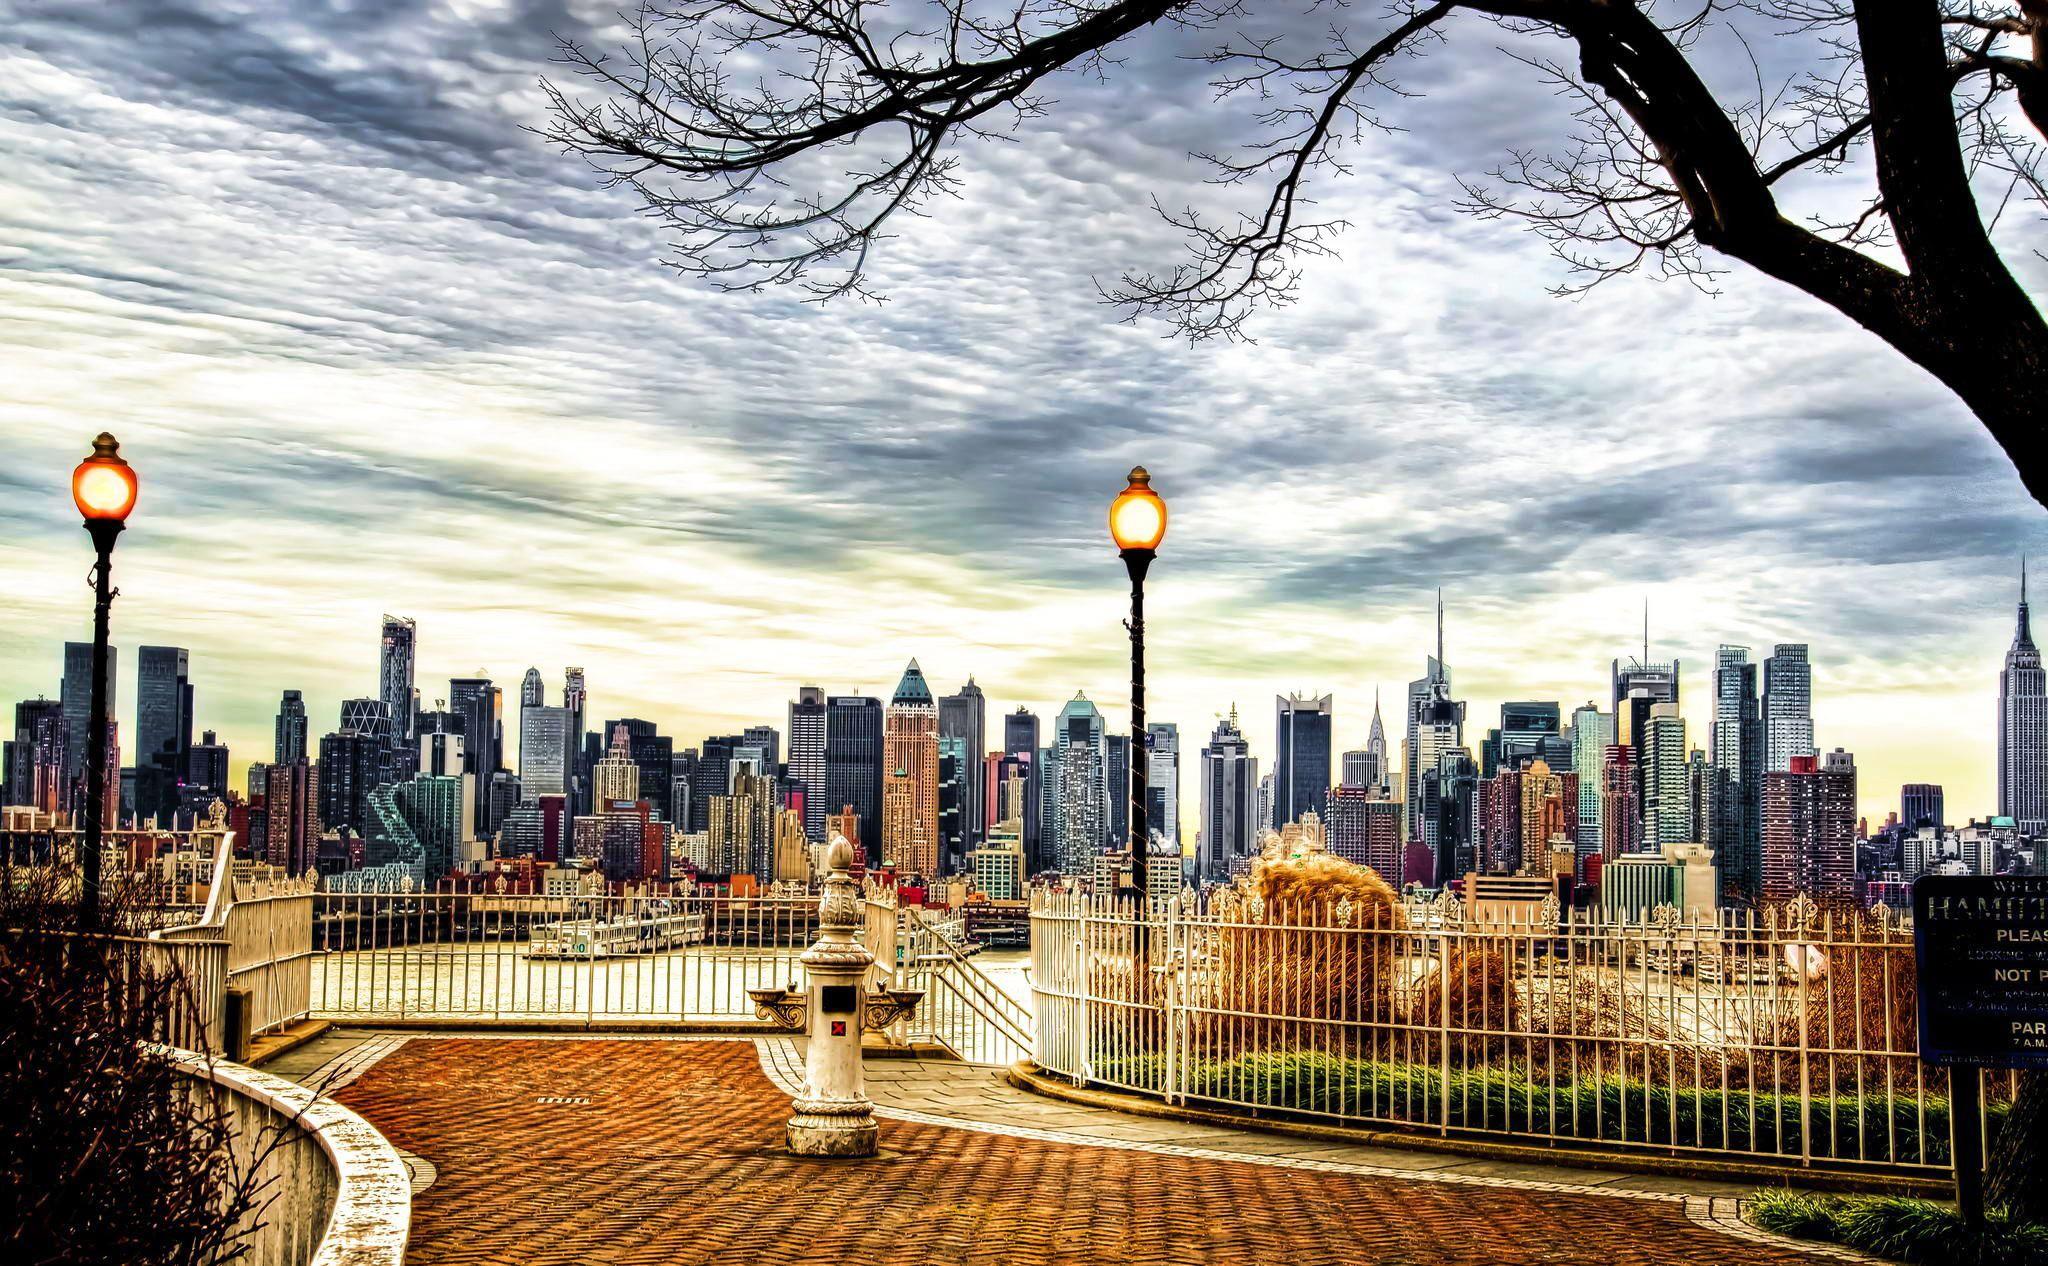 65 New York Free Wallpaper On Wallpapersafari